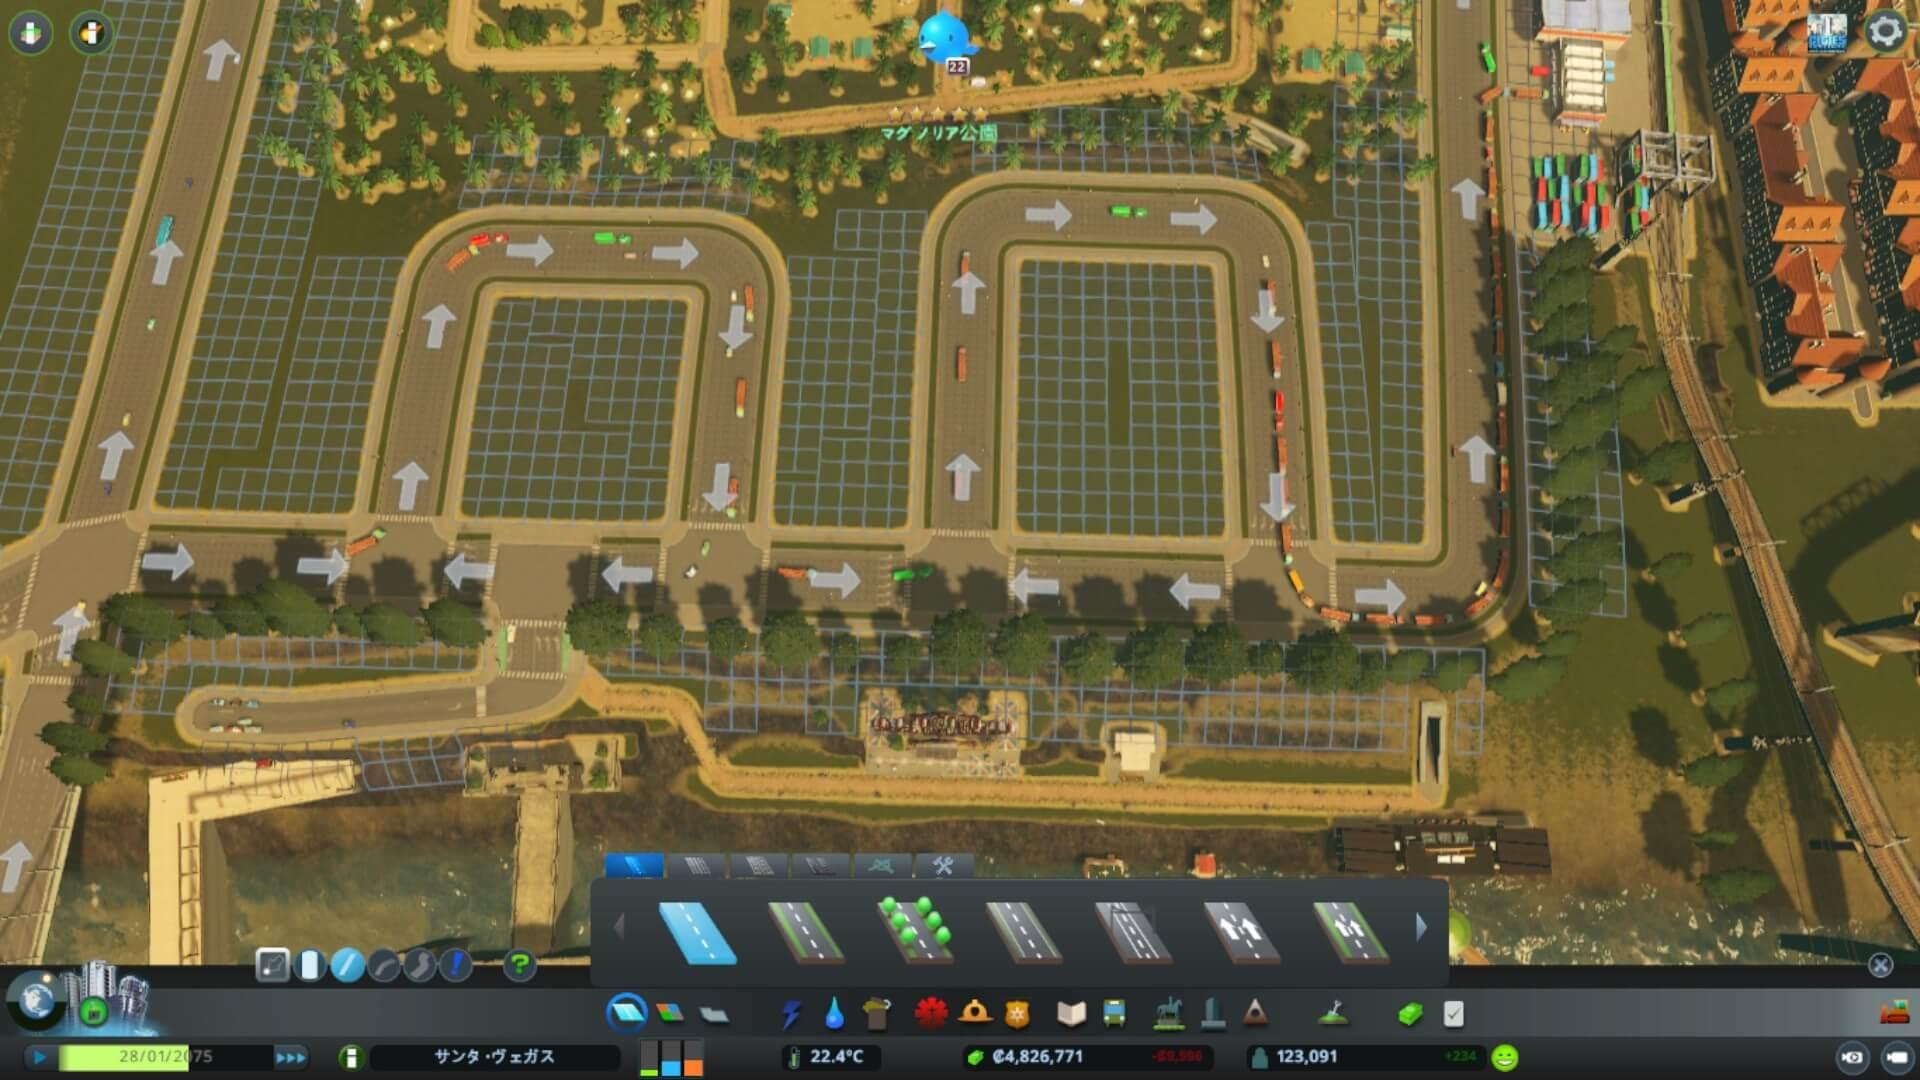 cities-skylines-cargo01-1024x576 【Cities:skylines攻略ブログ】 渋滞しない貨物港駅・貨物ハブの作り方 Cities:Skylines(シティーズ:スカイライン ) 街作りシミュレーションゲーム